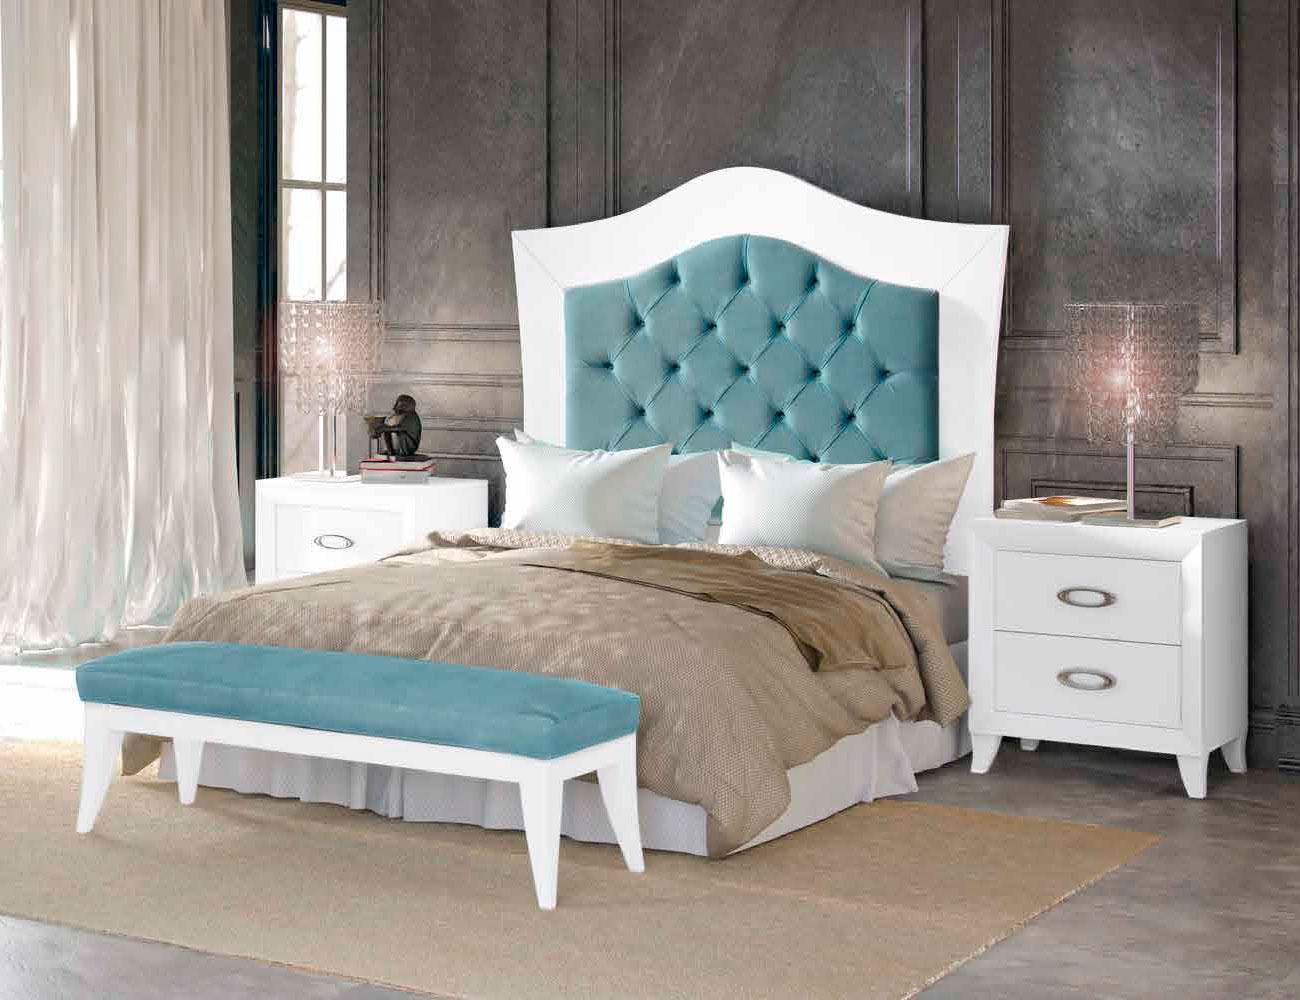 Dormitorio matrimonio romantico turquesa patas isabelinas 2